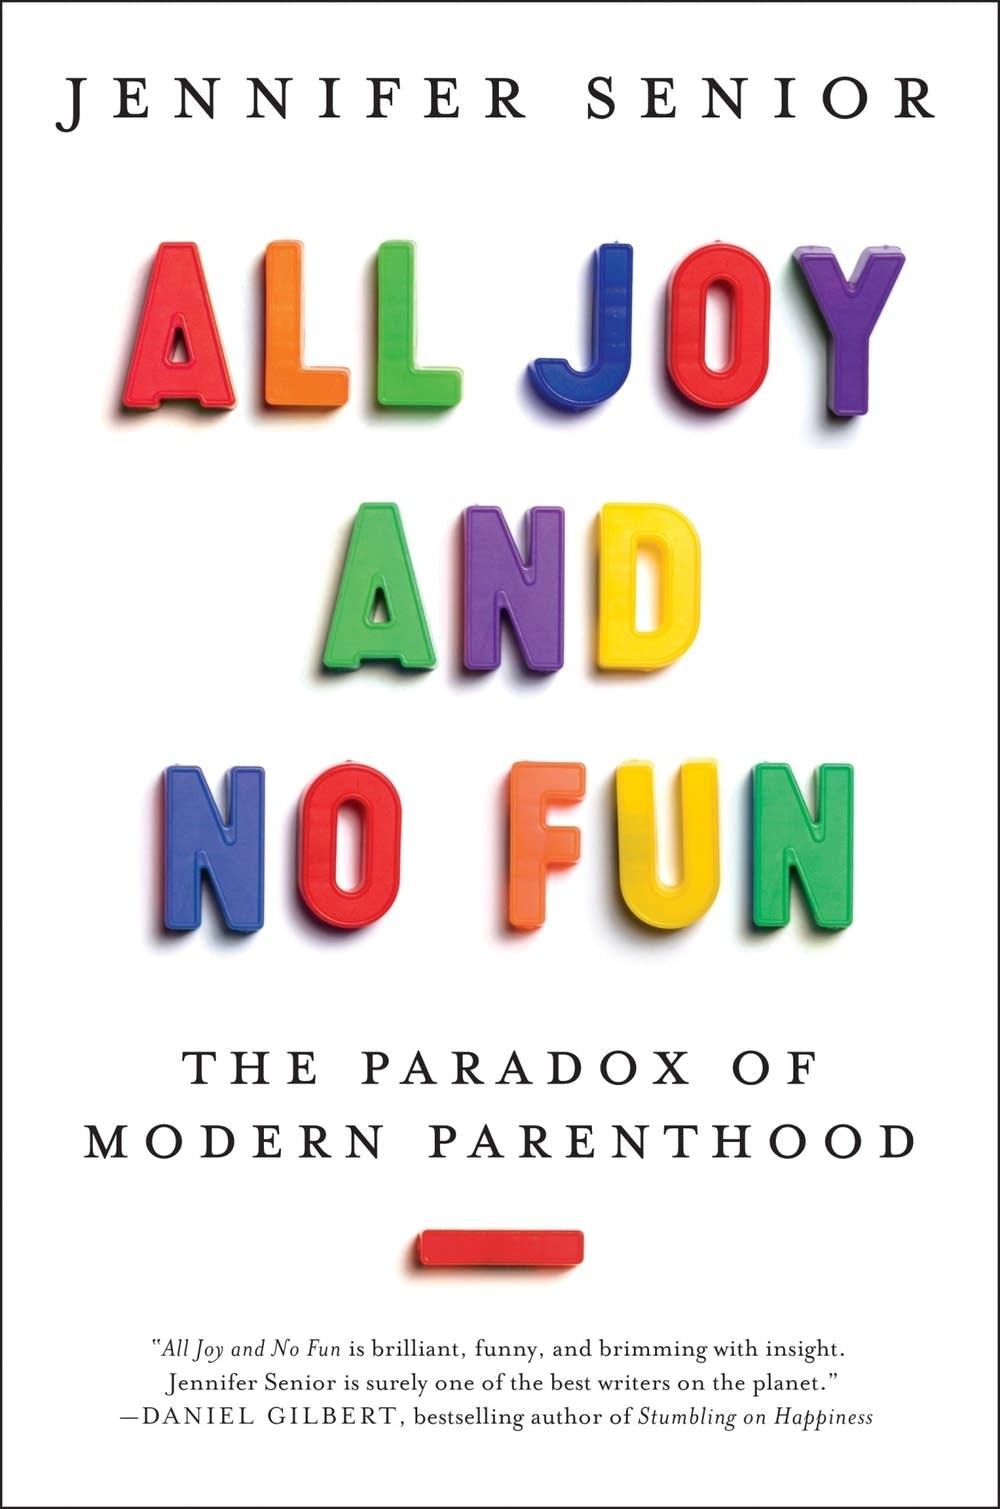 'All Joy and No Fun'